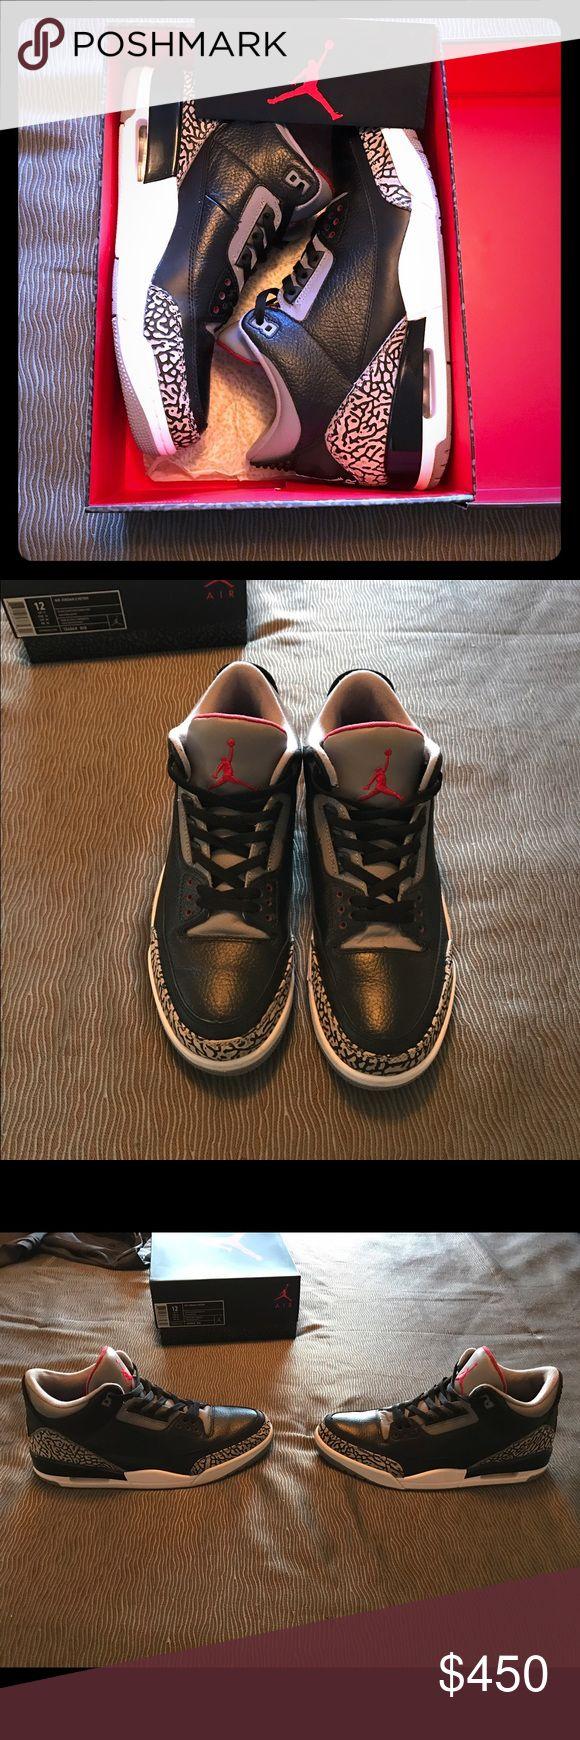 Air Jordan Retro Cement 3's New, barely worn Jordan cement 3's. Still in perfect condition Jordan Shoes Sneakers